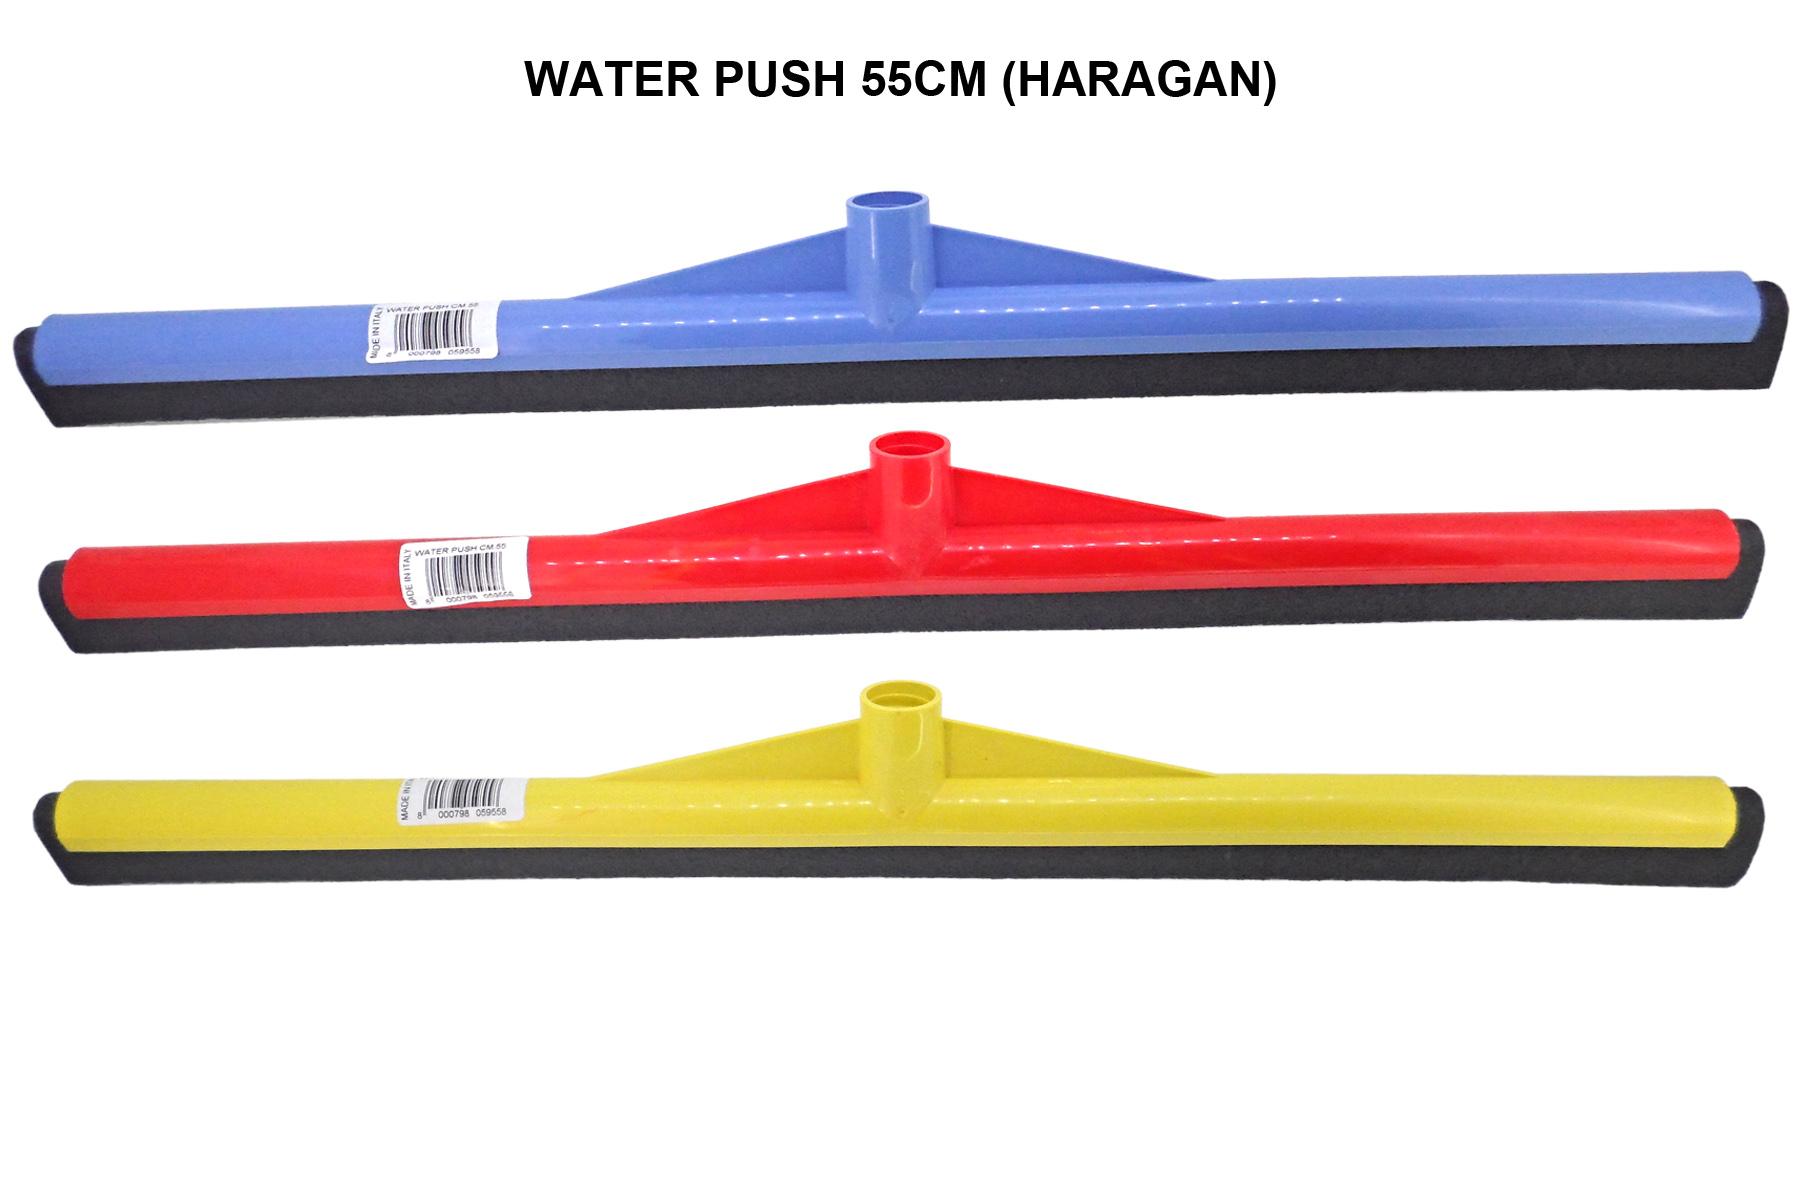 WATER PUSH 55CM (HARAGAN)